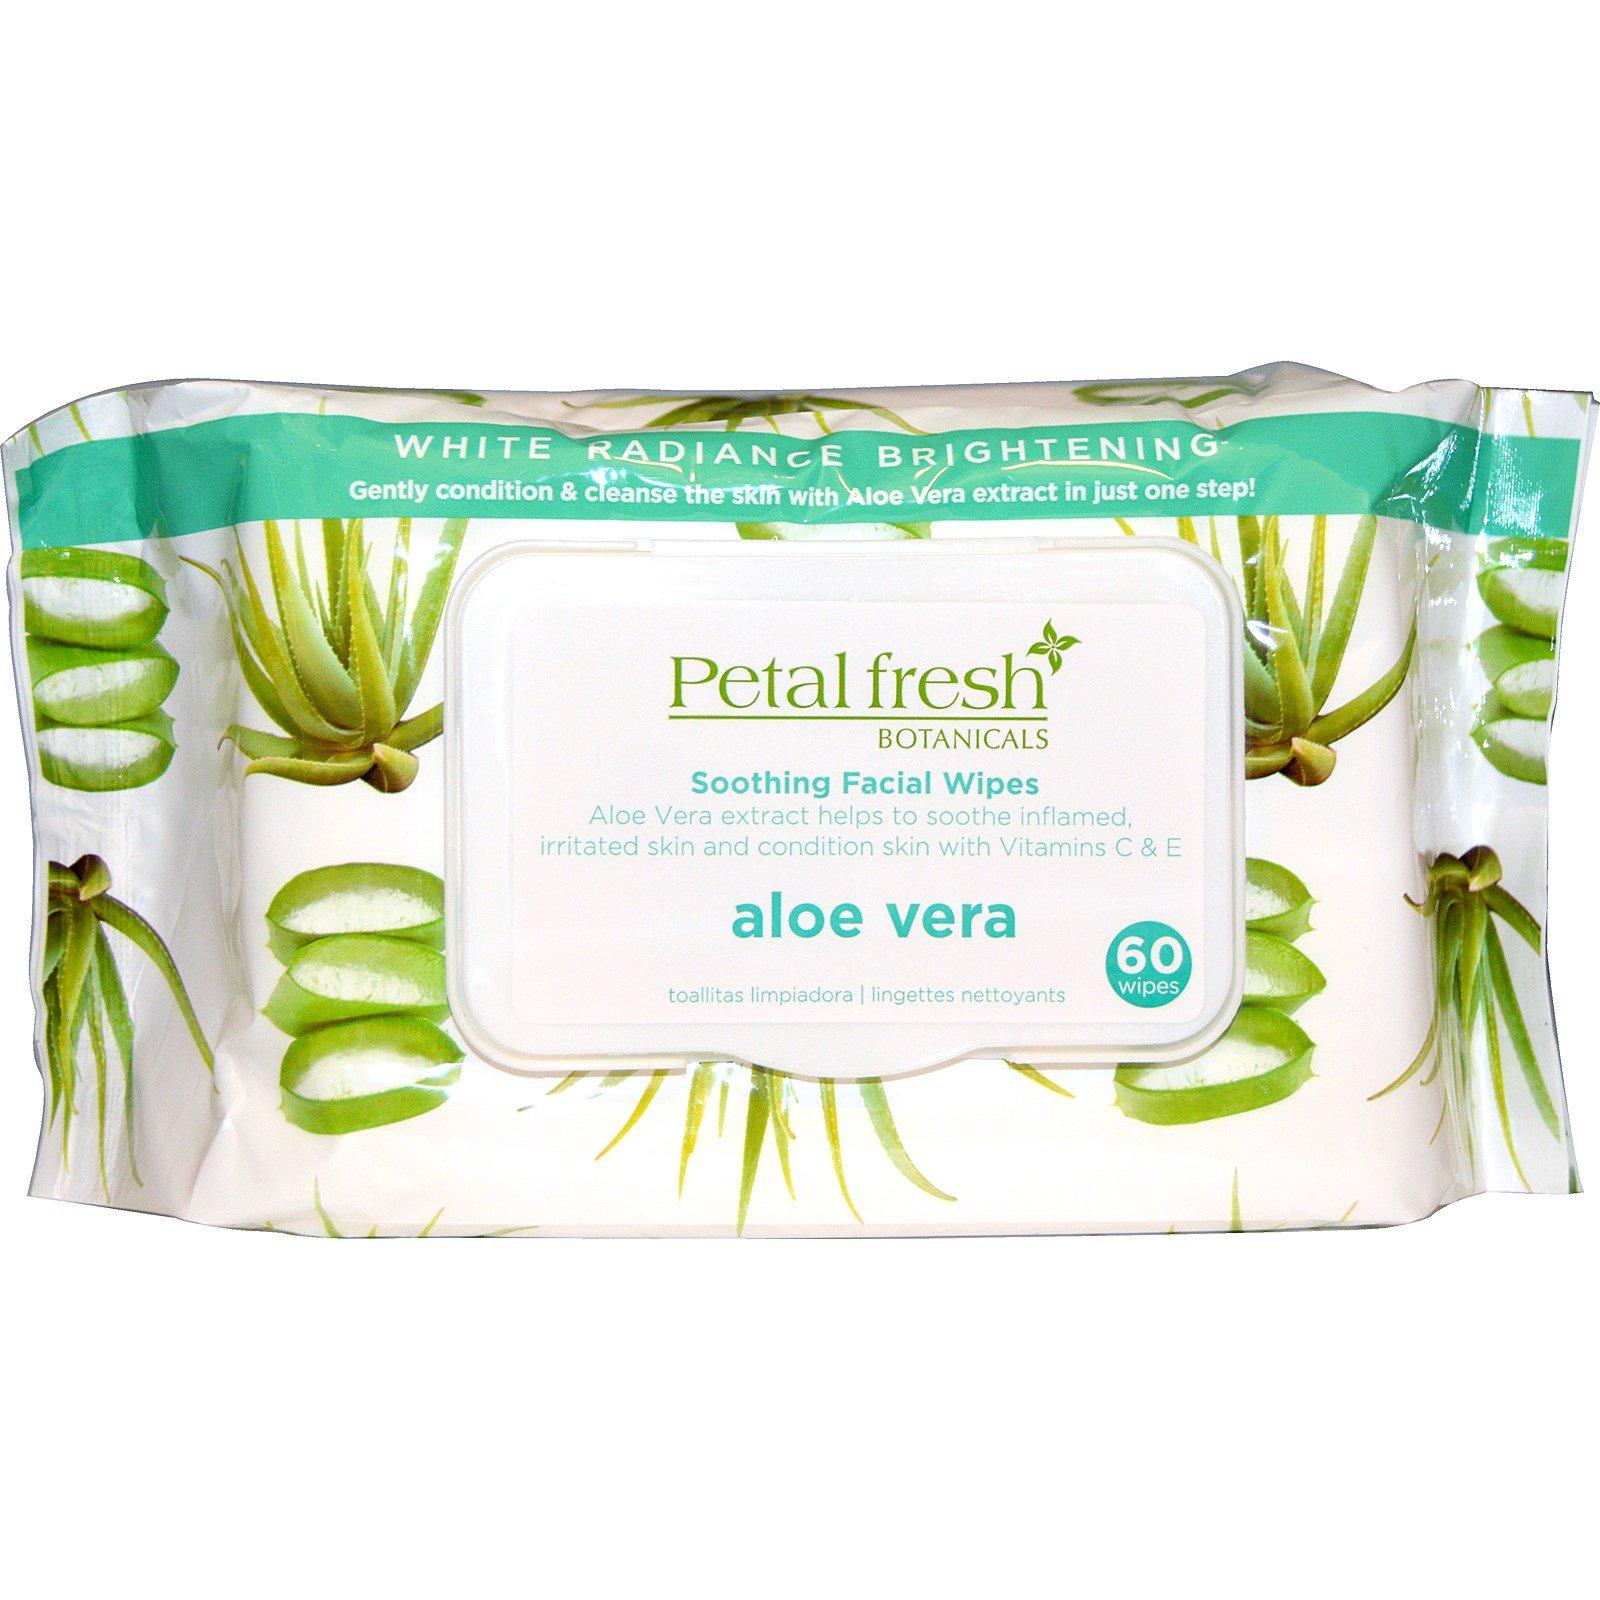 sunmark - Vaginal Yeast Treatment - 1% Strength Cream - 1 Each - 1.5 oz. Tube - McK